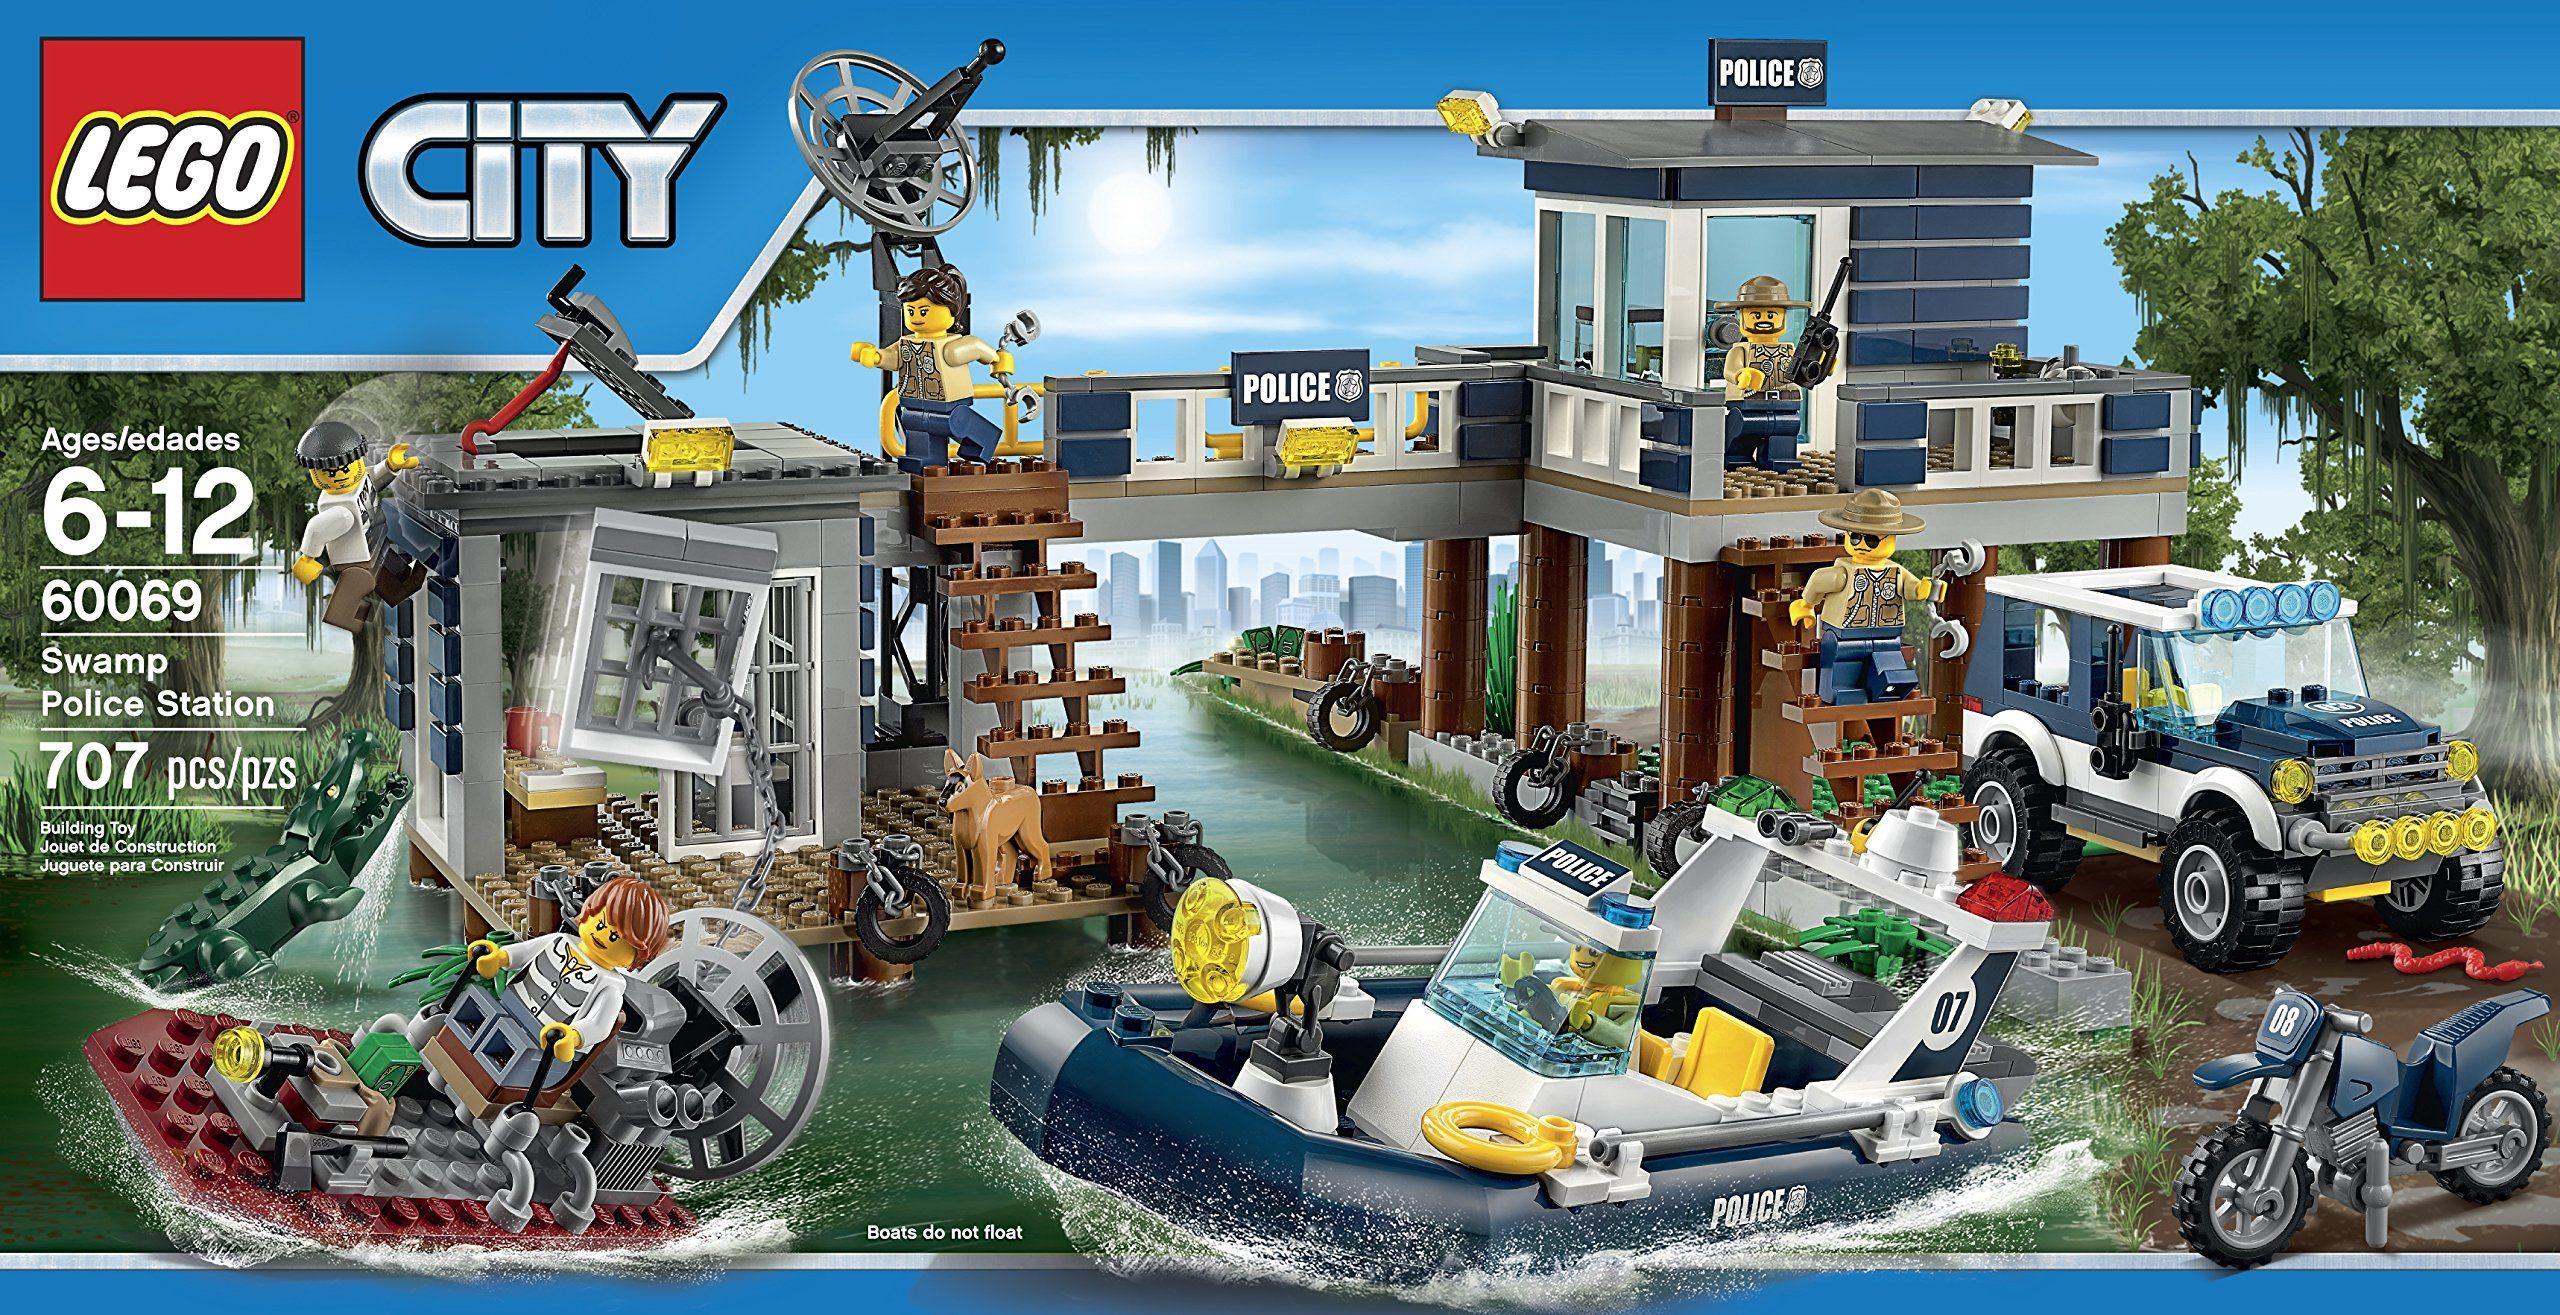 Robot Check Lego City Police Lego City Sets Lego City